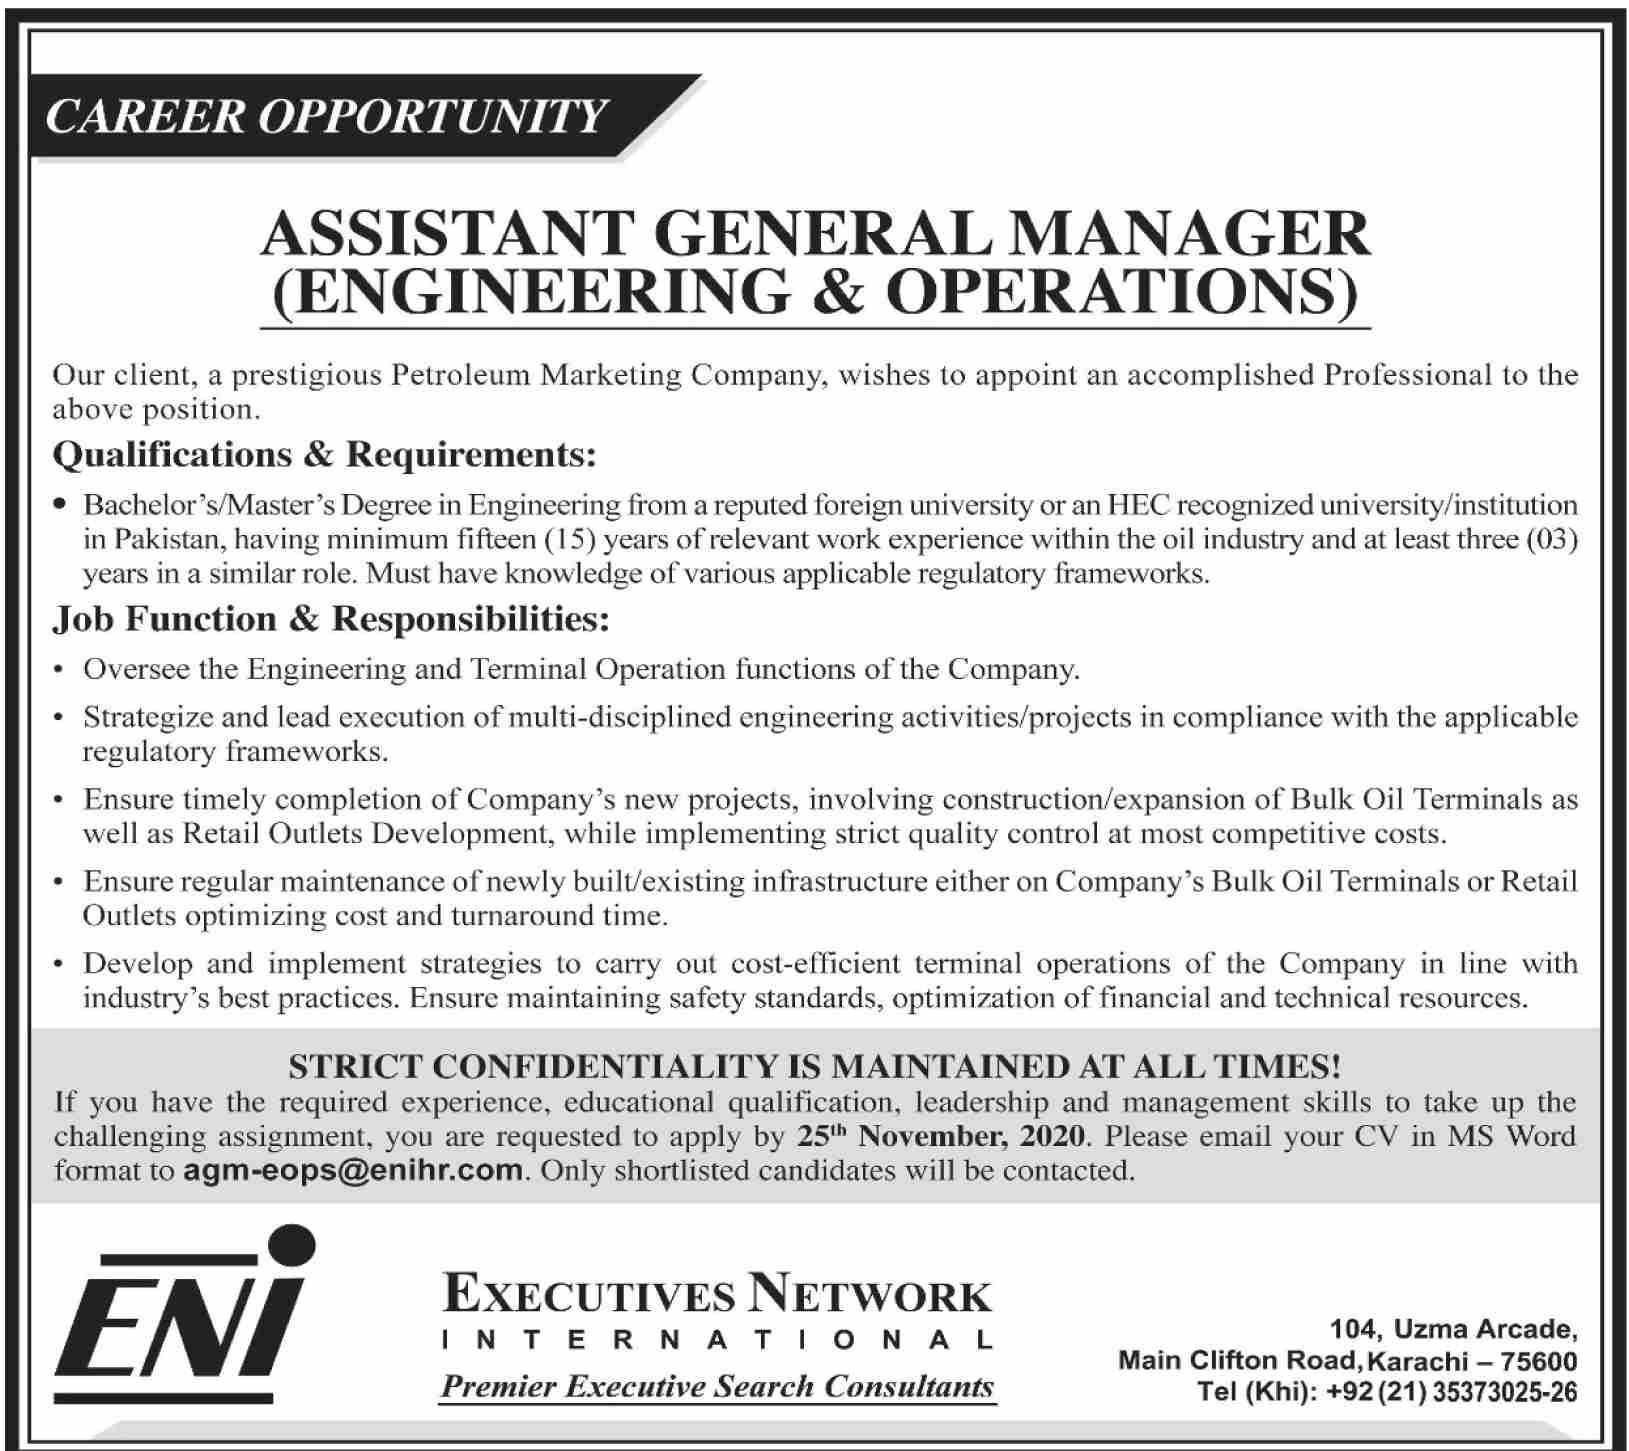 Assistant General Manager Job in Karachi